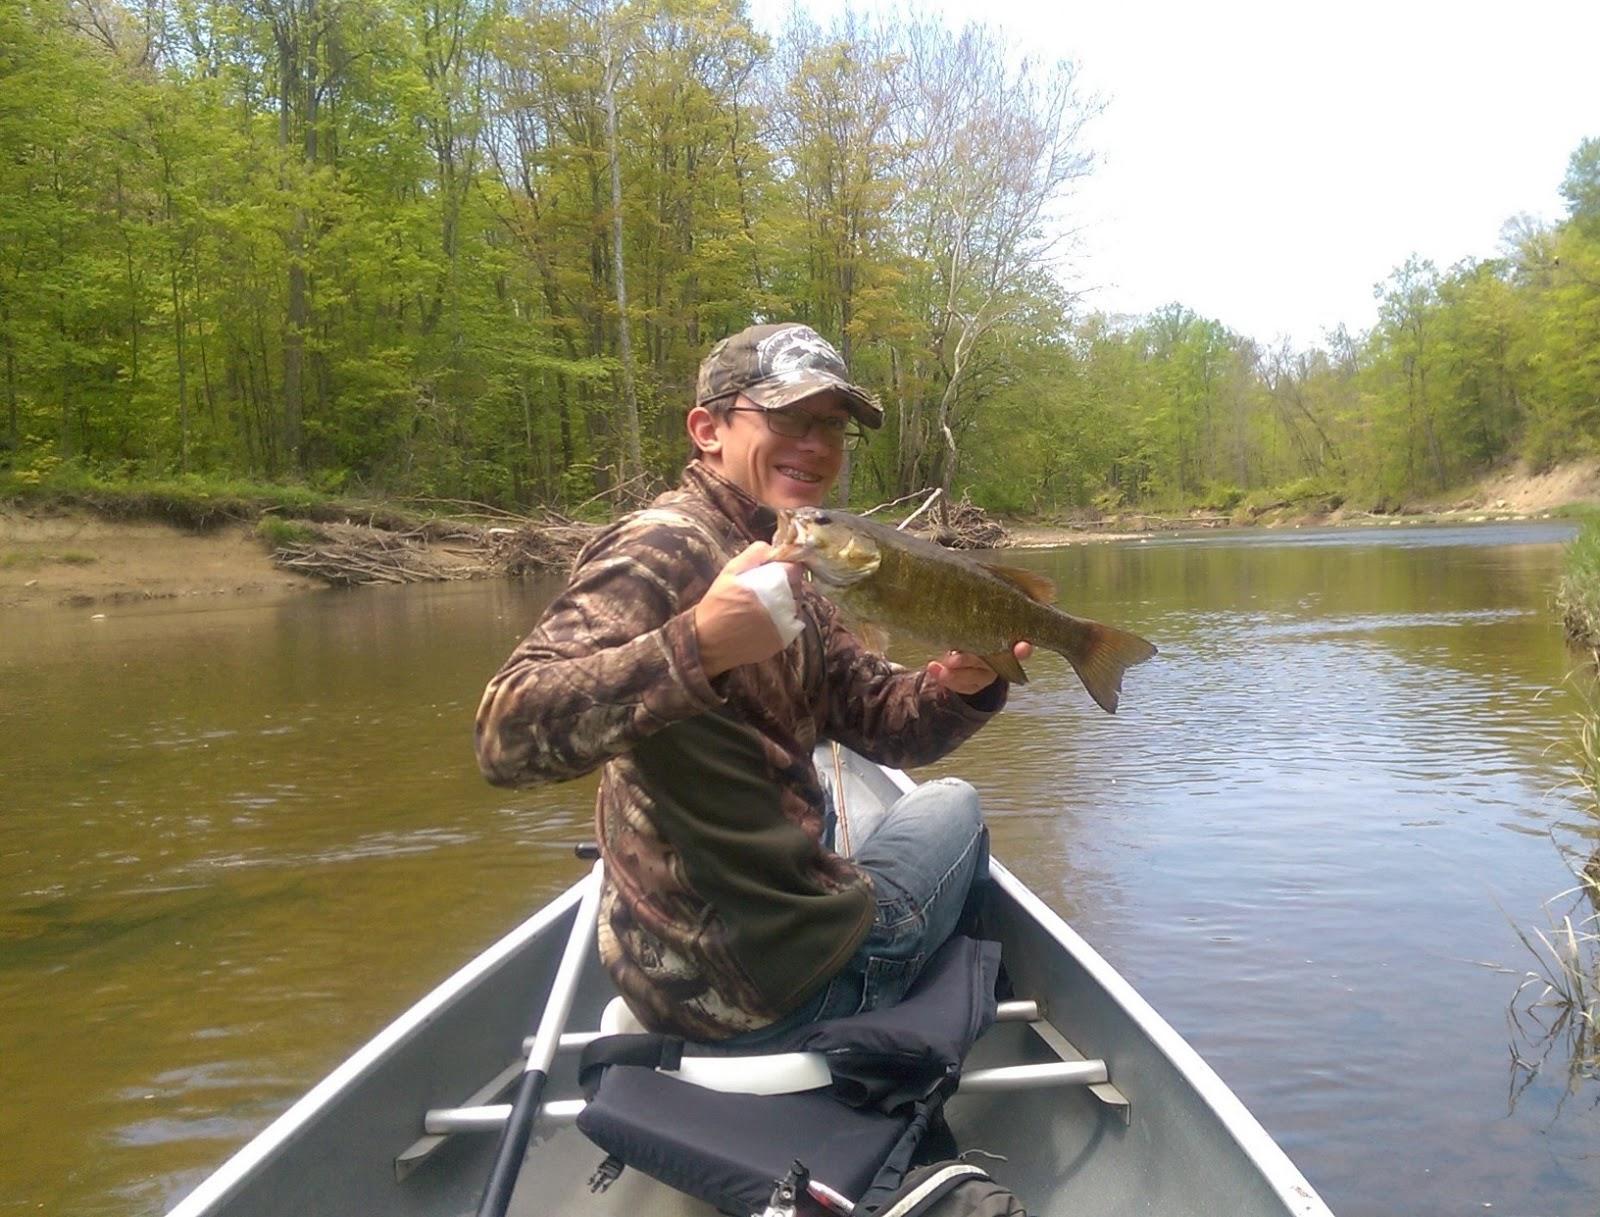 Lake Metroparks Fishing Report: Summer Fishing is Fun!